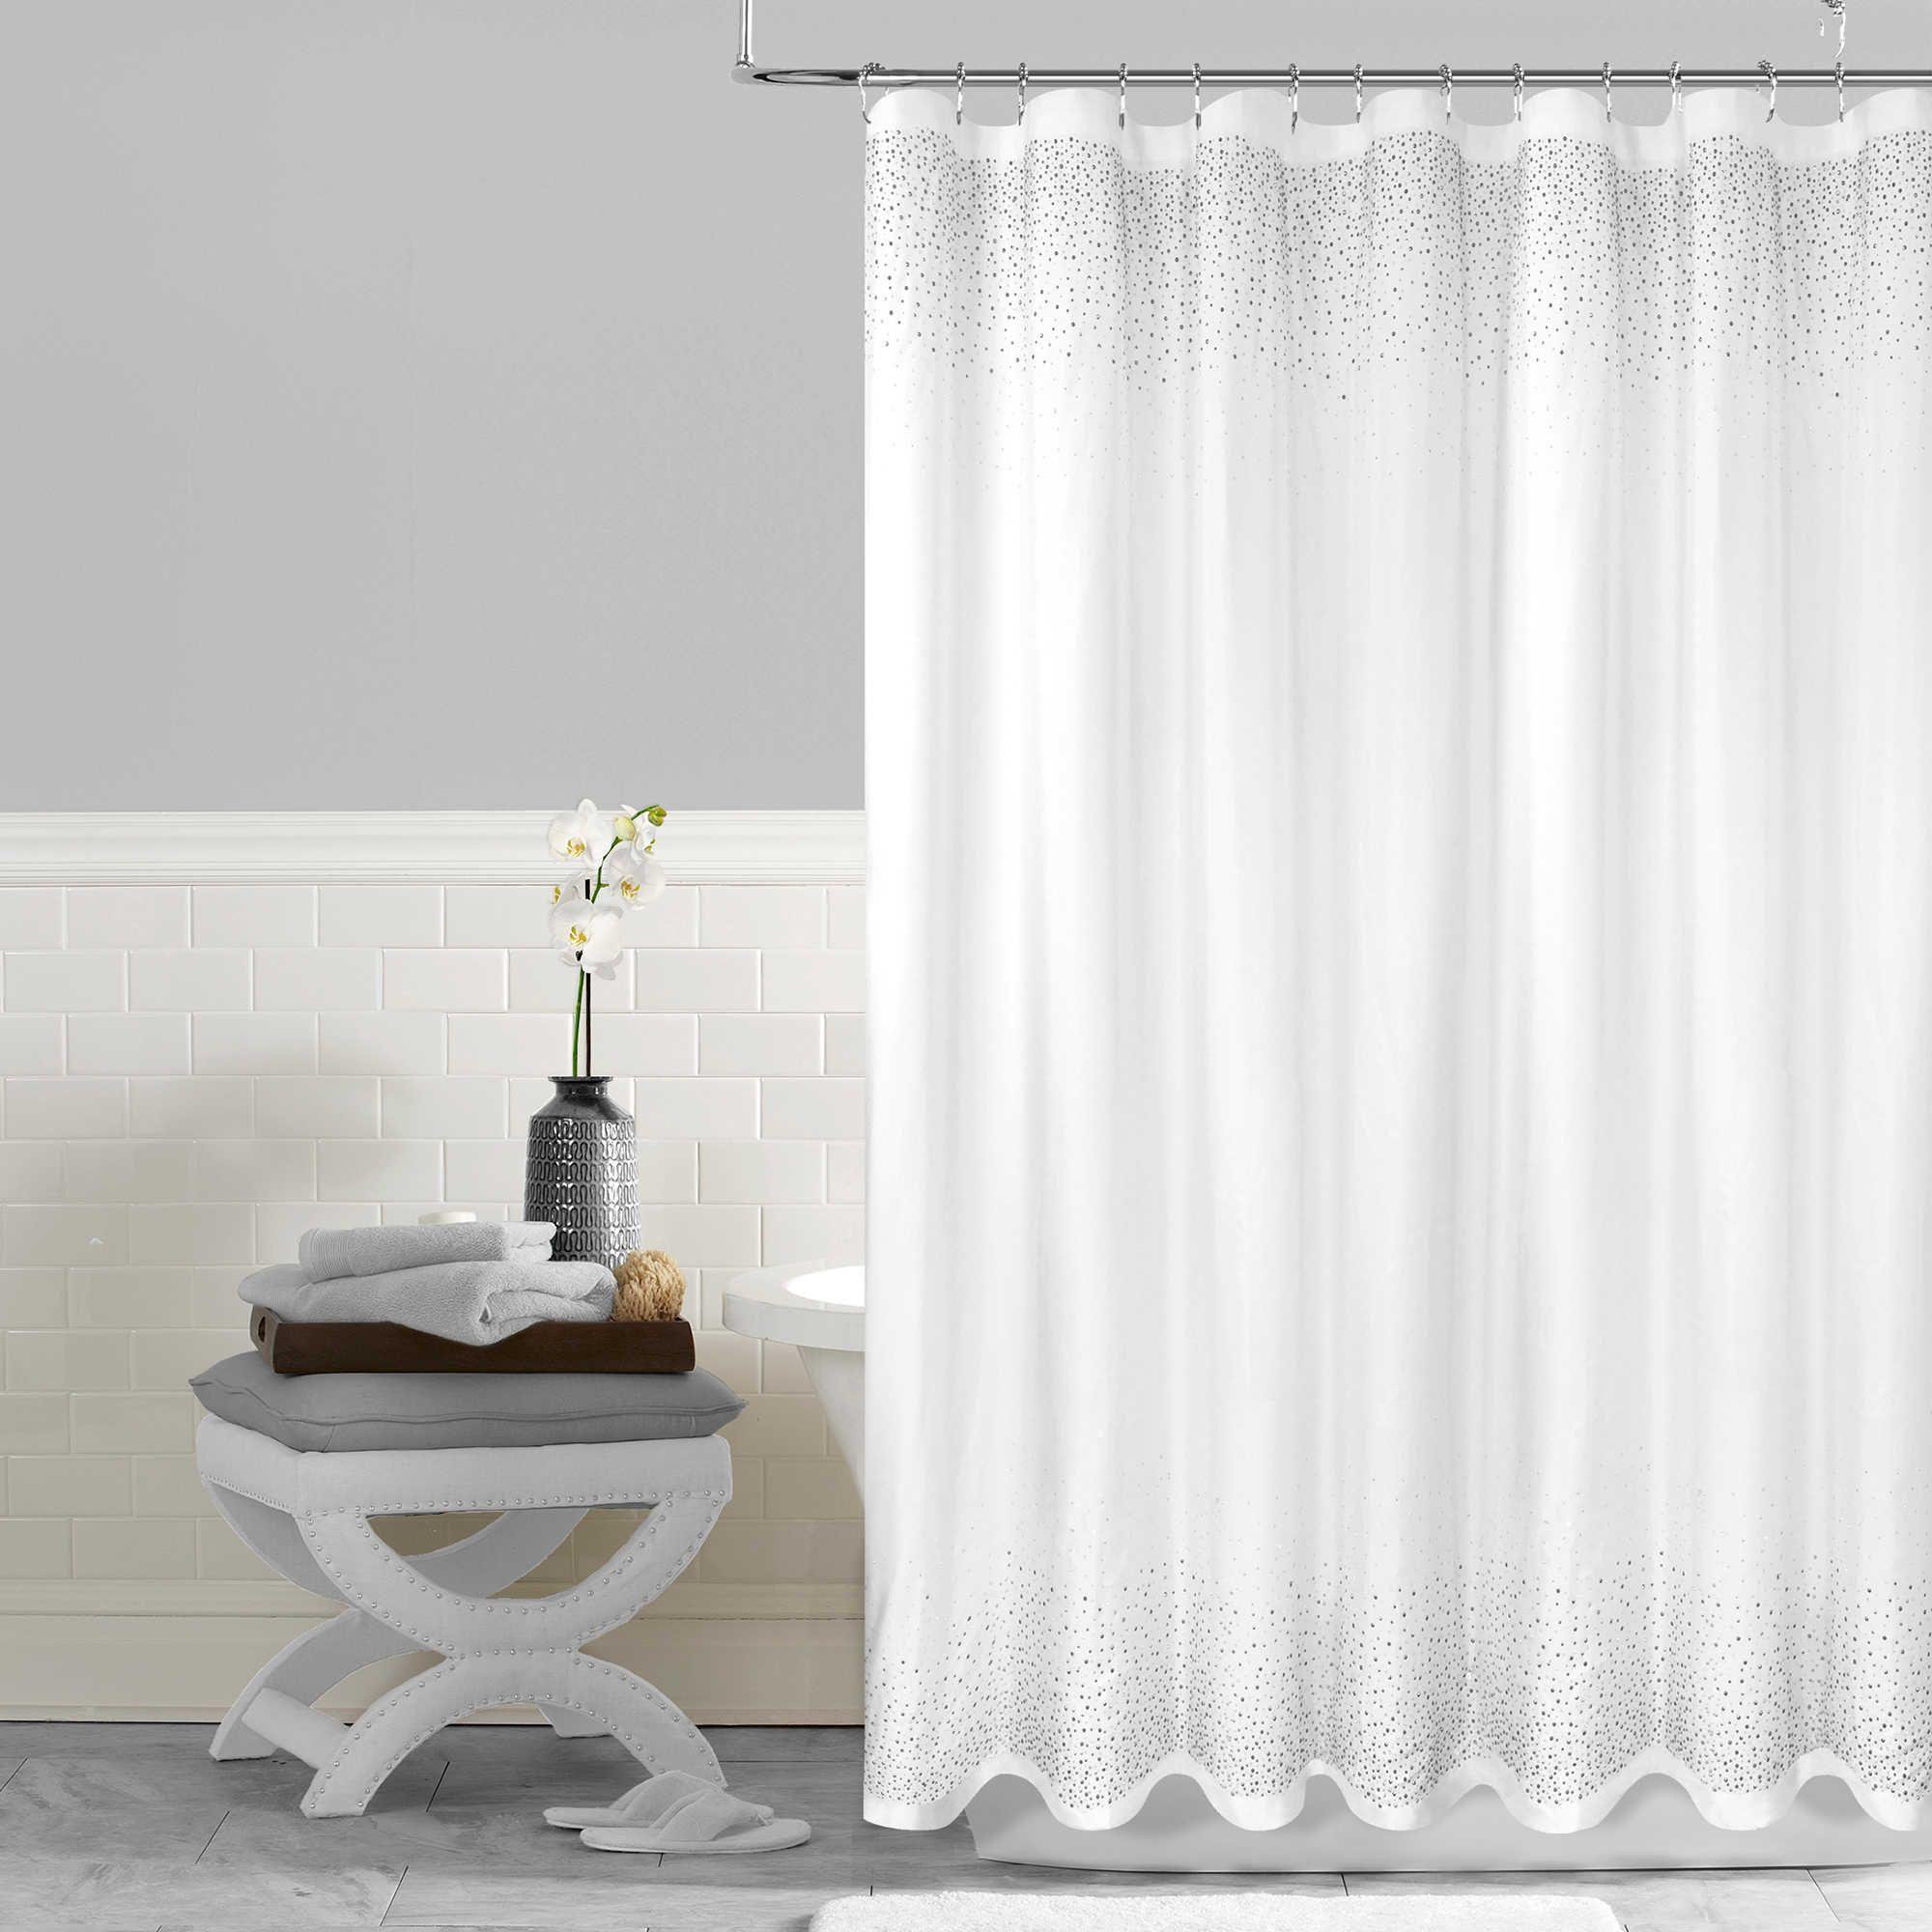 Twilight 54 Inch X 78 Shower Curtain In White